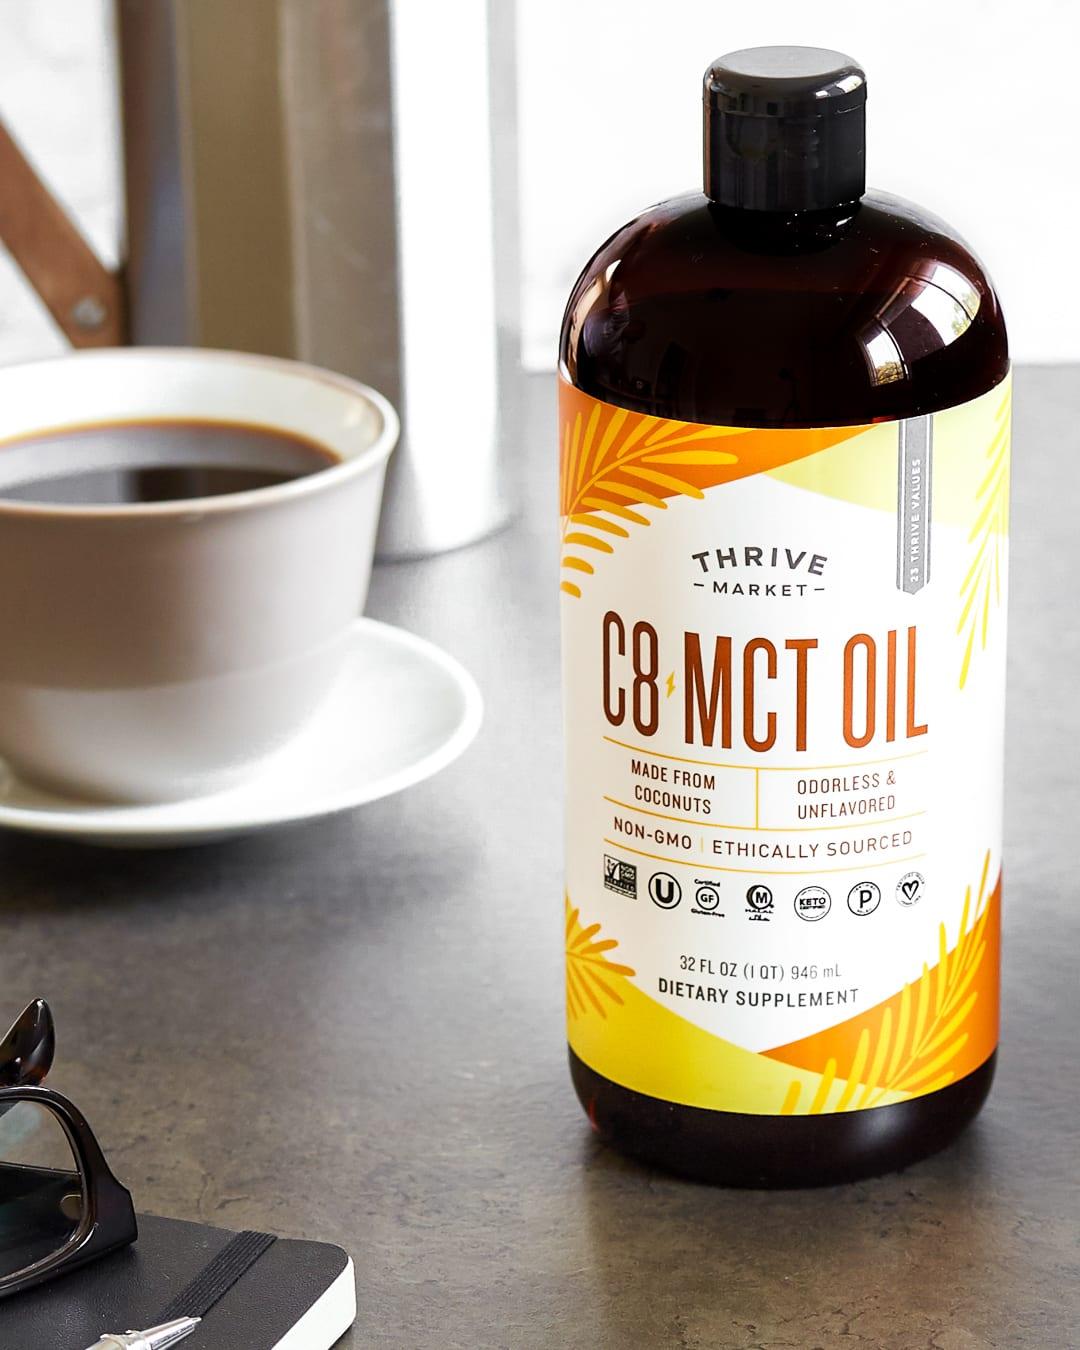 Thrive Market C8 MCT Oil Primal Gourmet Paleo Whole30